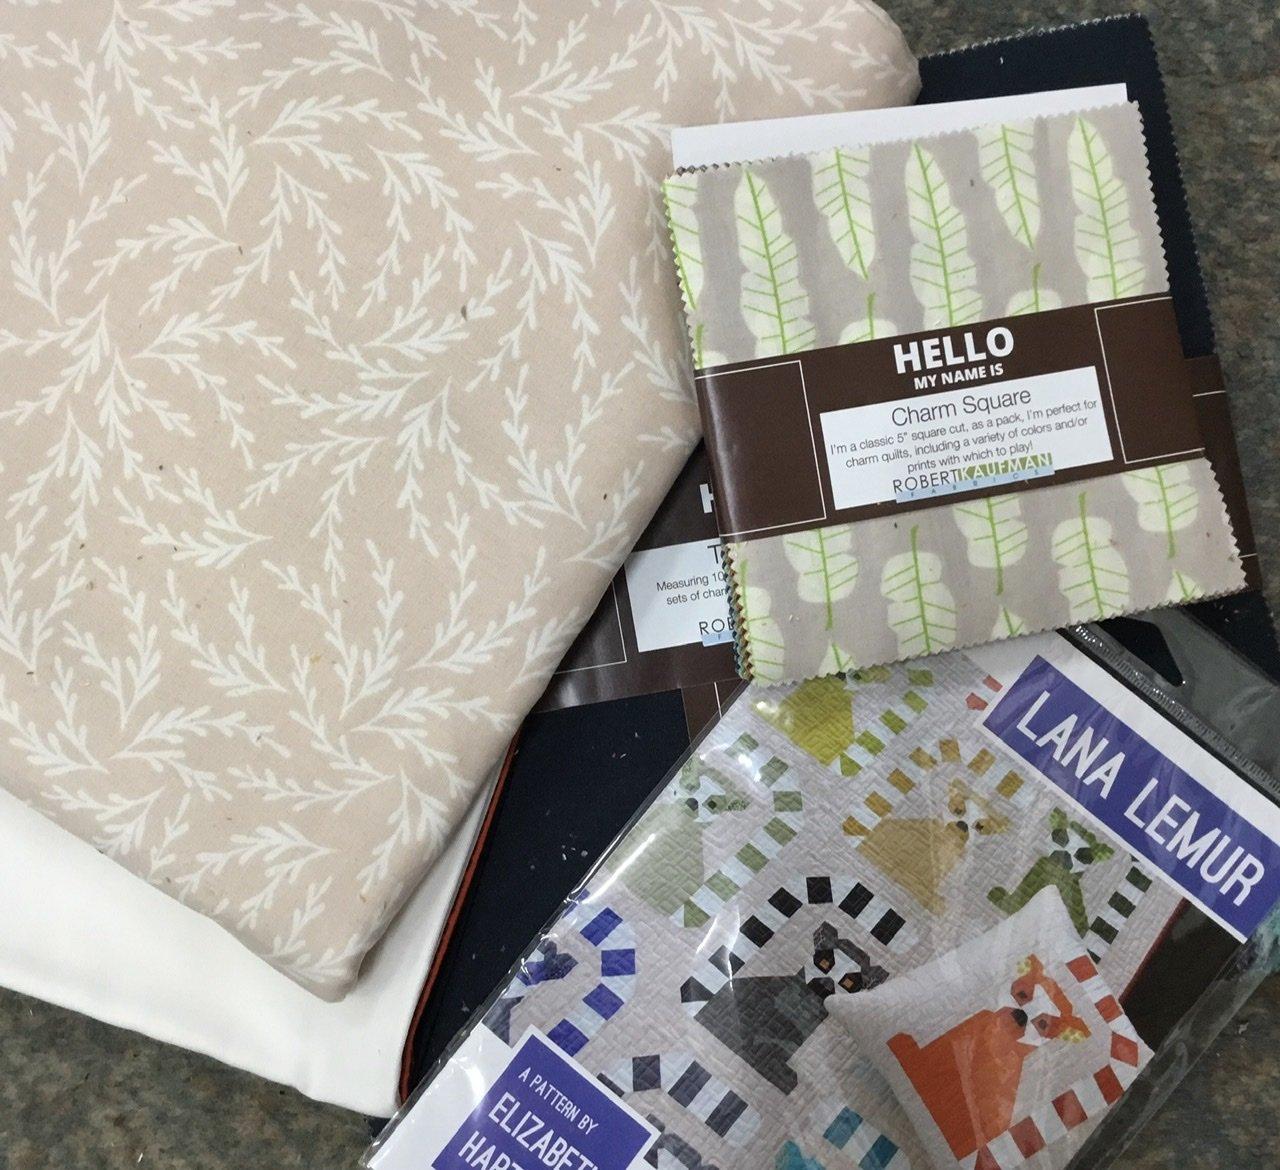 Lana Lemur quilt top kit